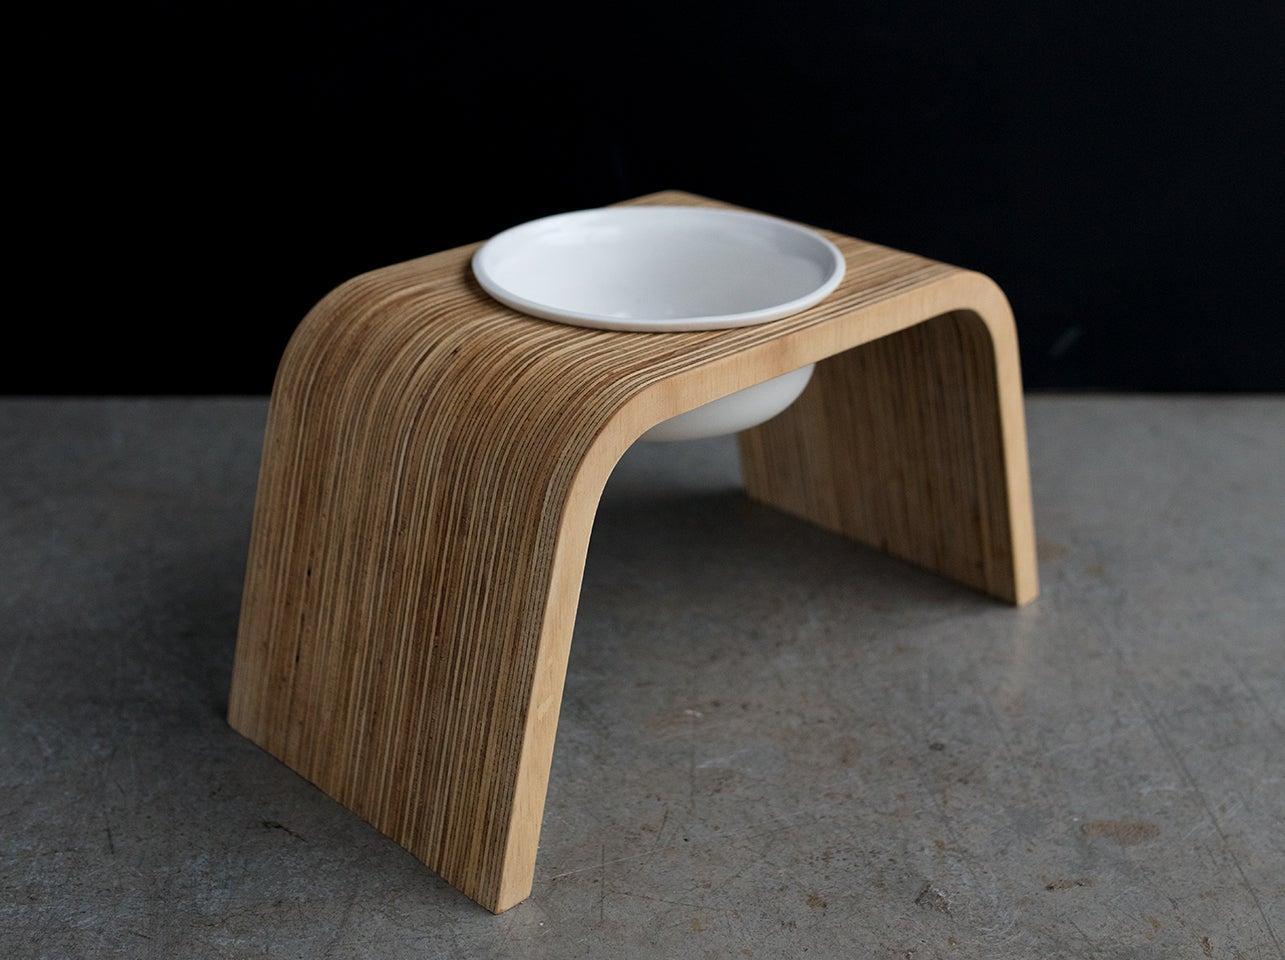 howl  home  modern dog feeders  dog bowls — dog bowl stand set  - image of dog bowl stand set single tall